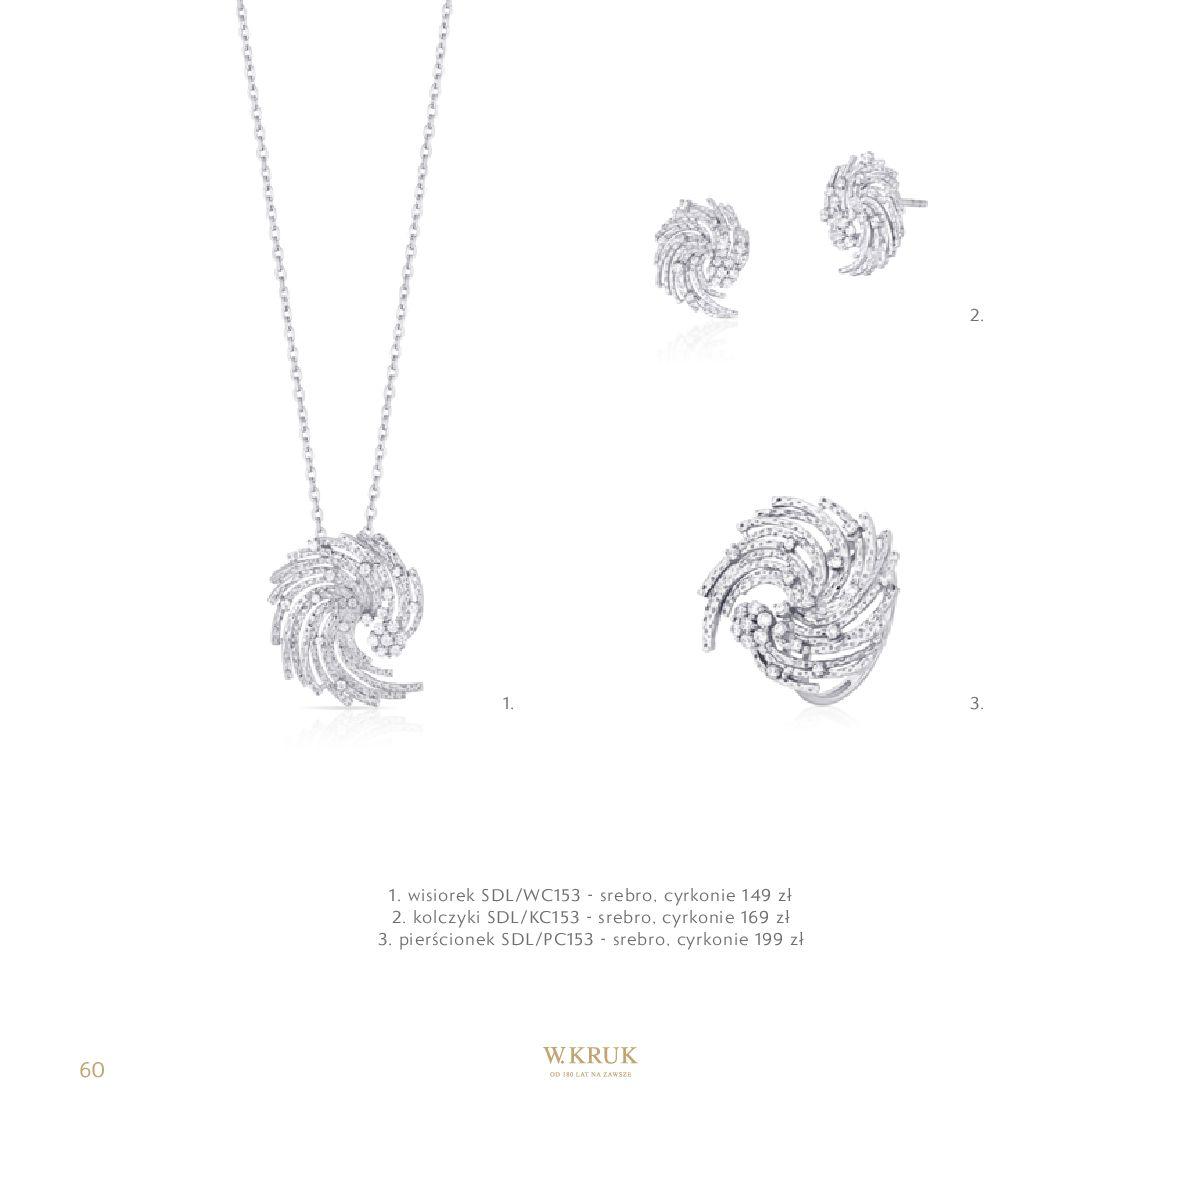 Gazetka W. KRUK: Katalog - Kolekcja Blask 2021-02-17 page-61